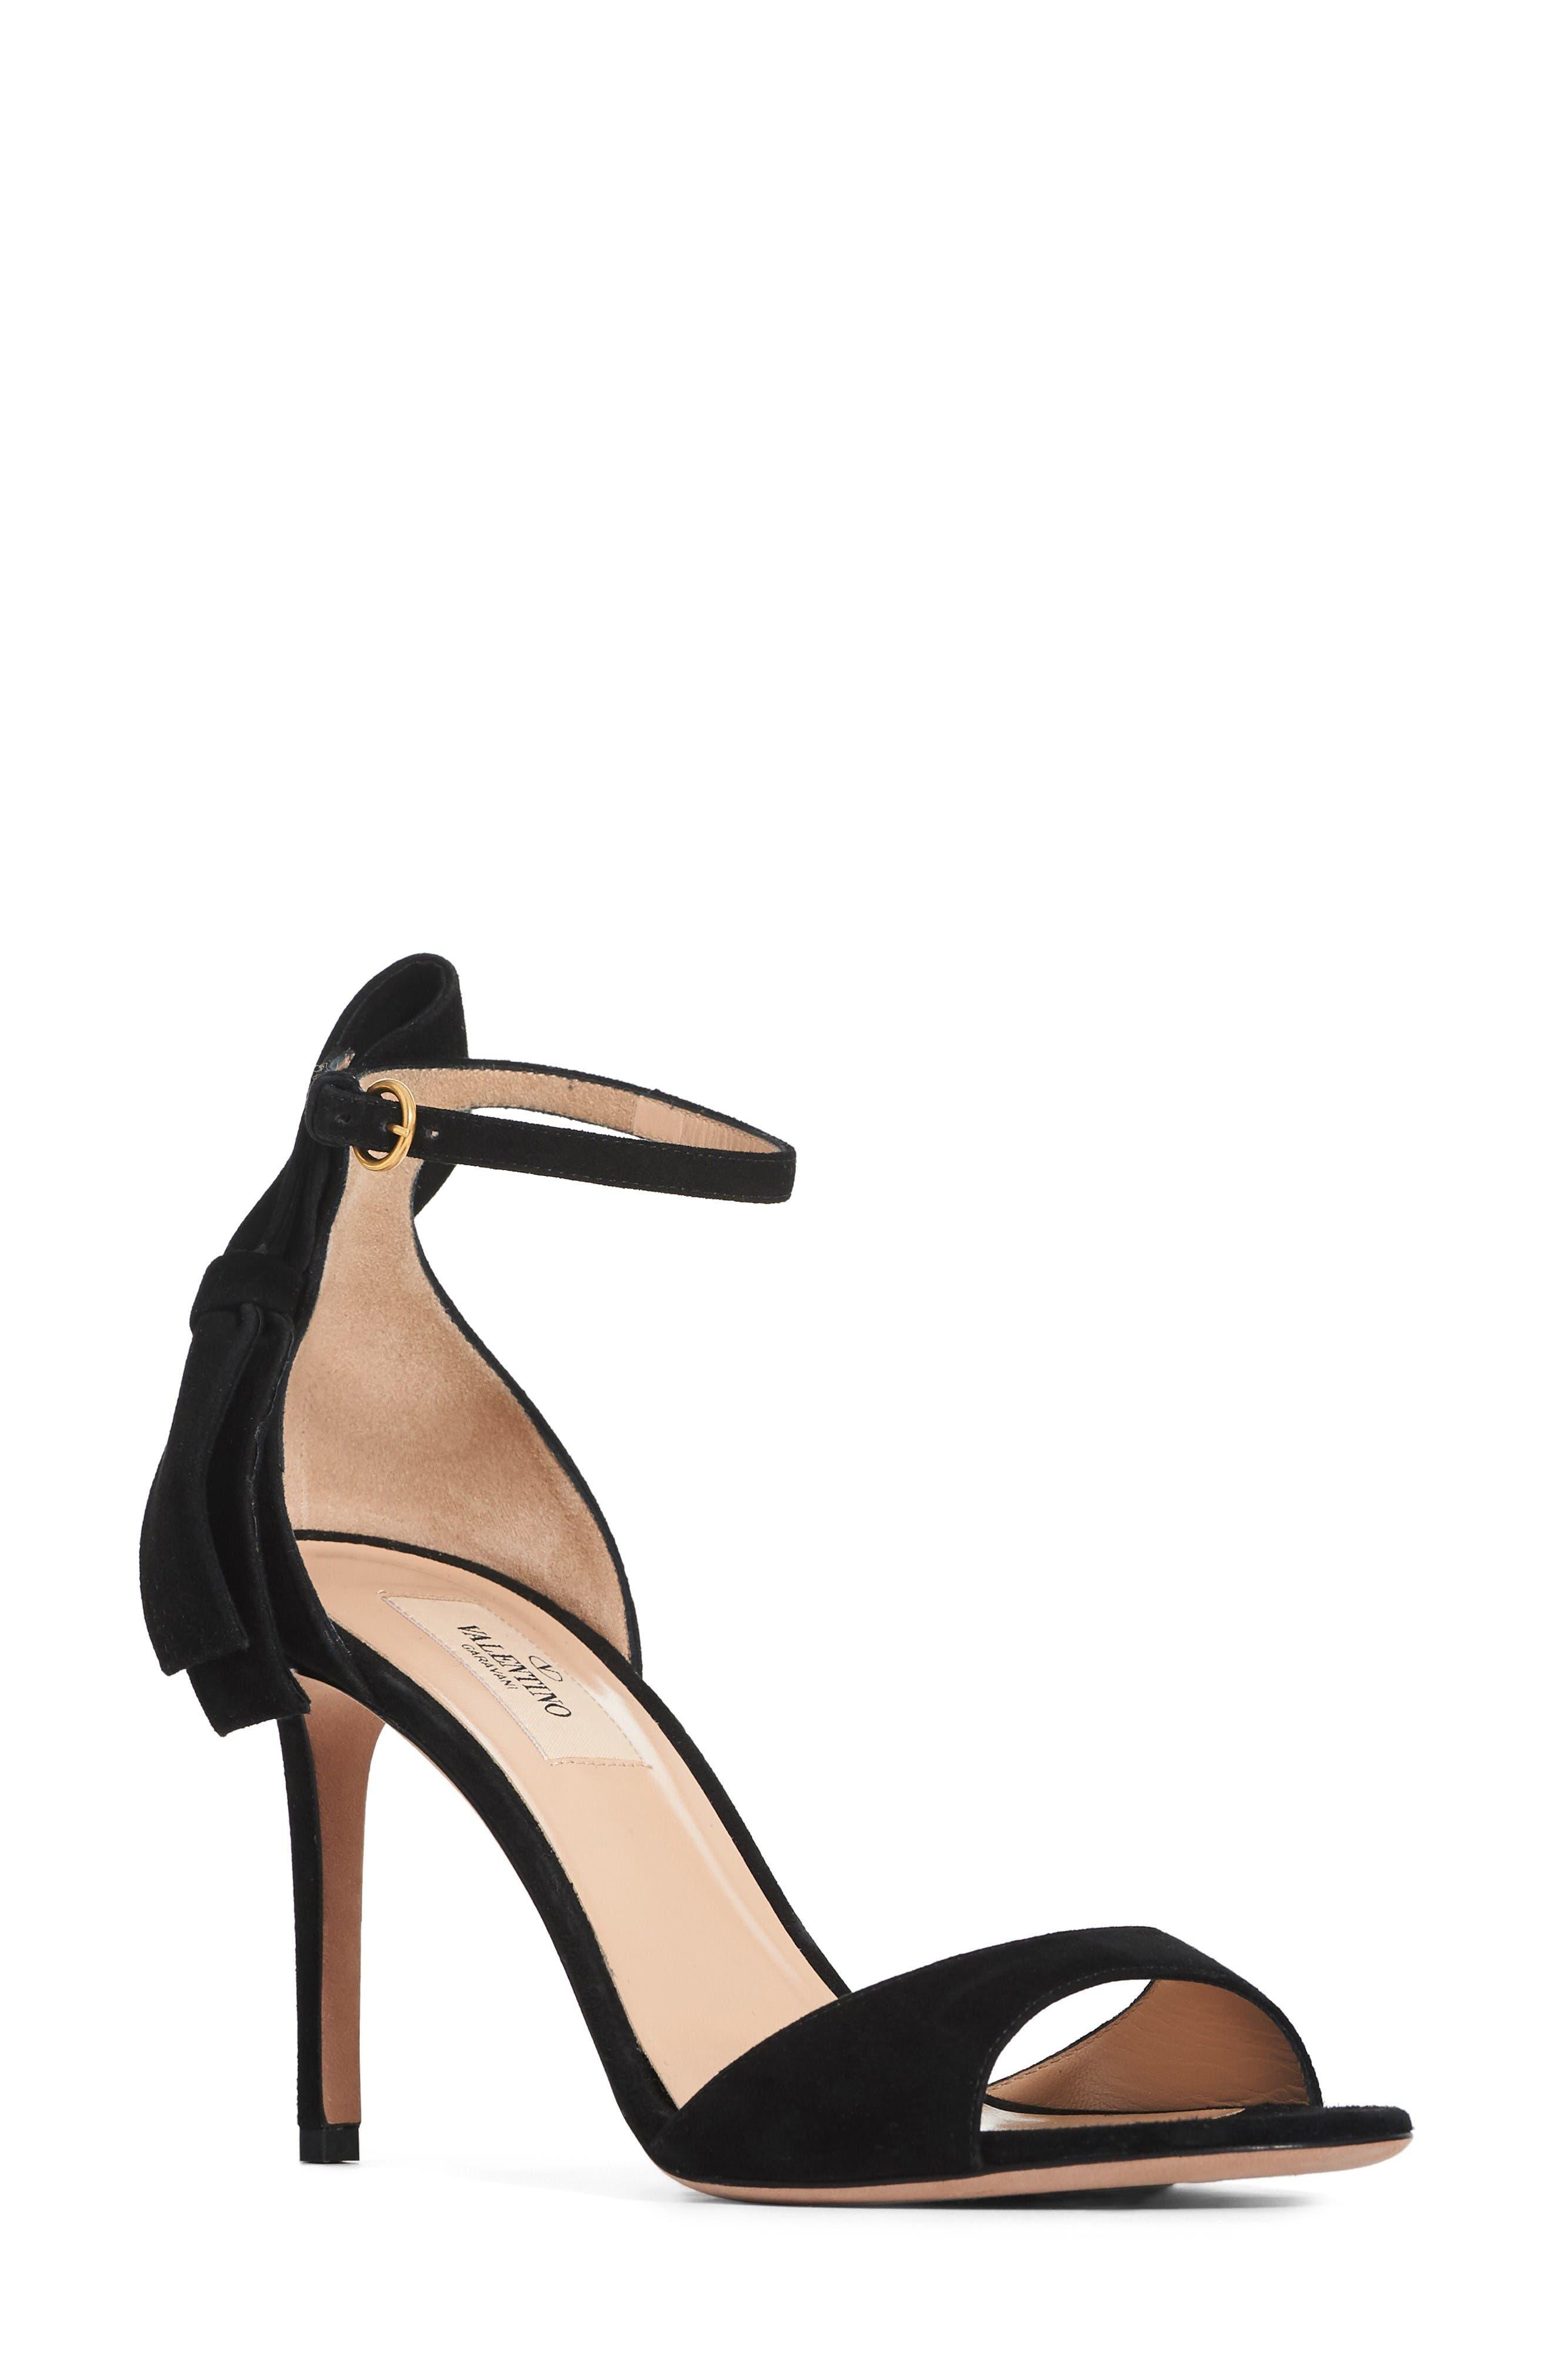 Main Image - Valentino Bow Heel Sandal (Women)